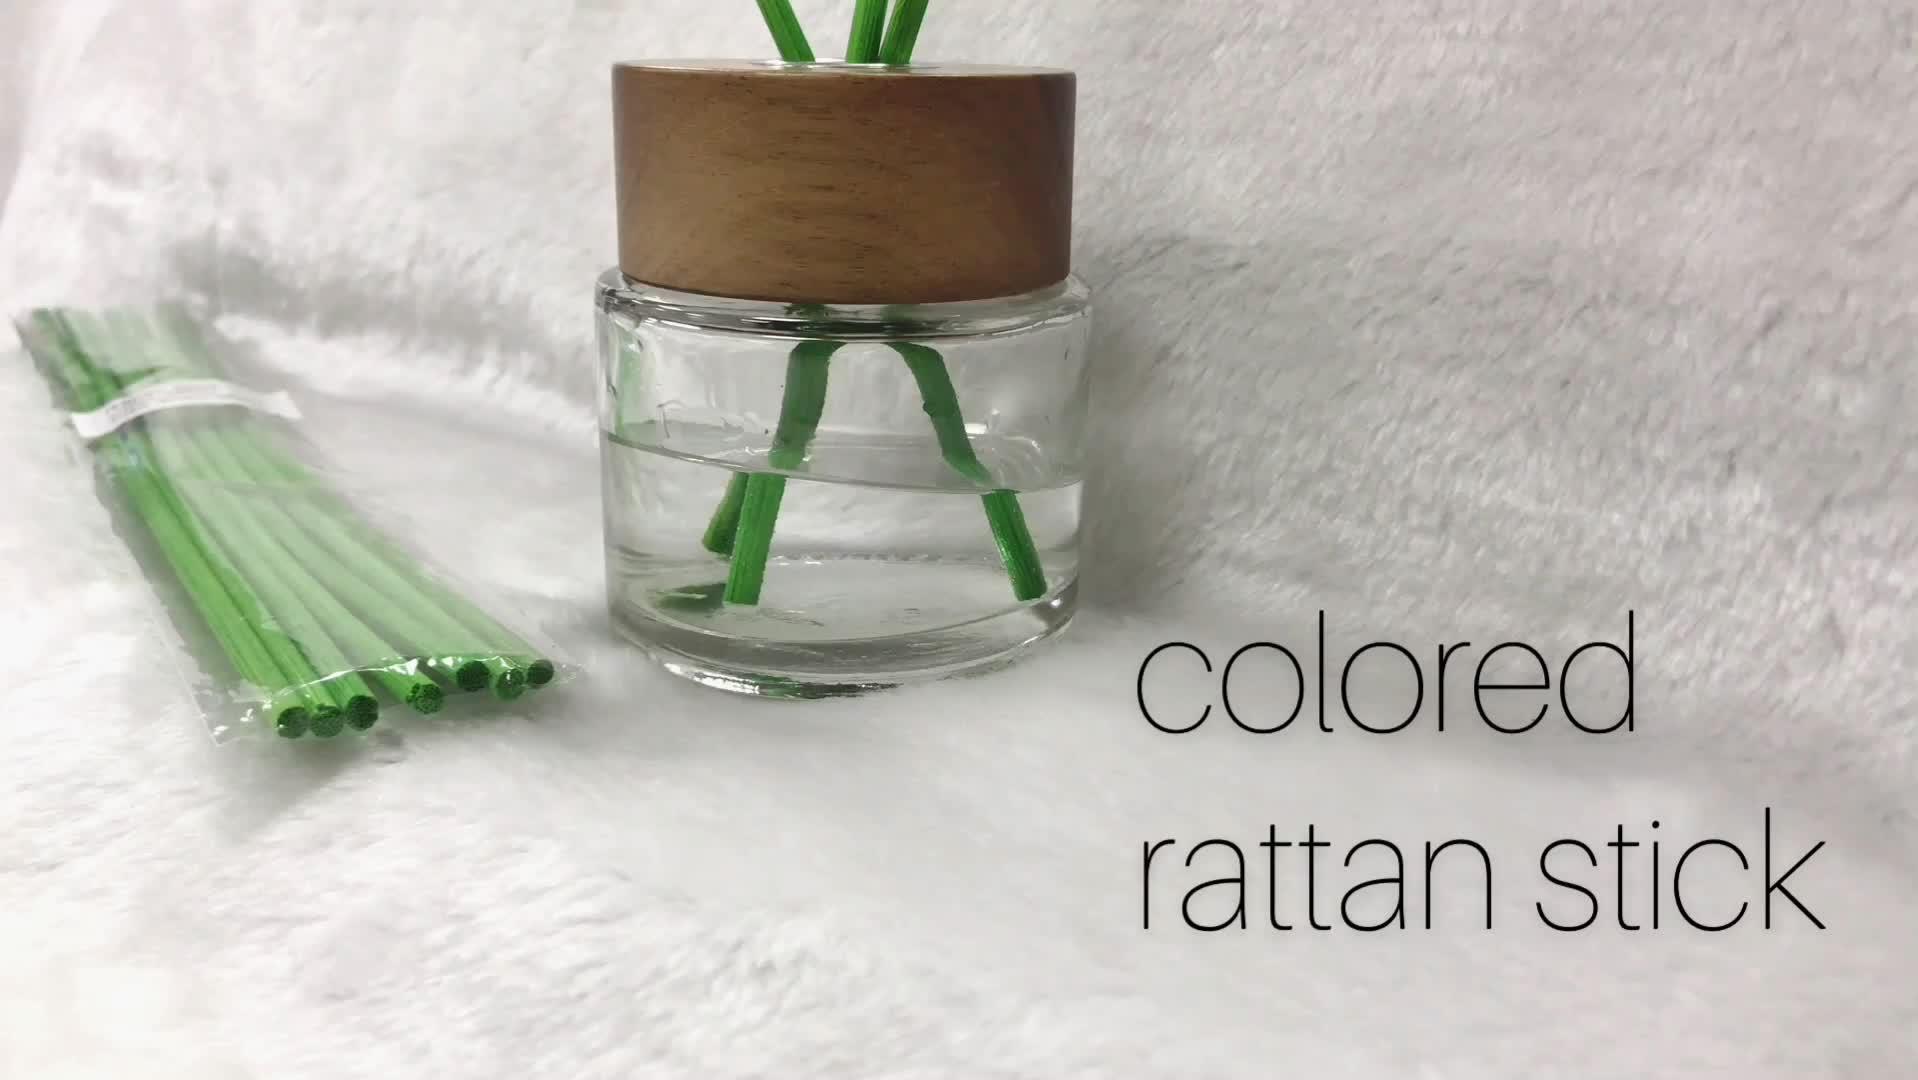 Amazon Hot Sale Colored Reed Diffuser Stick